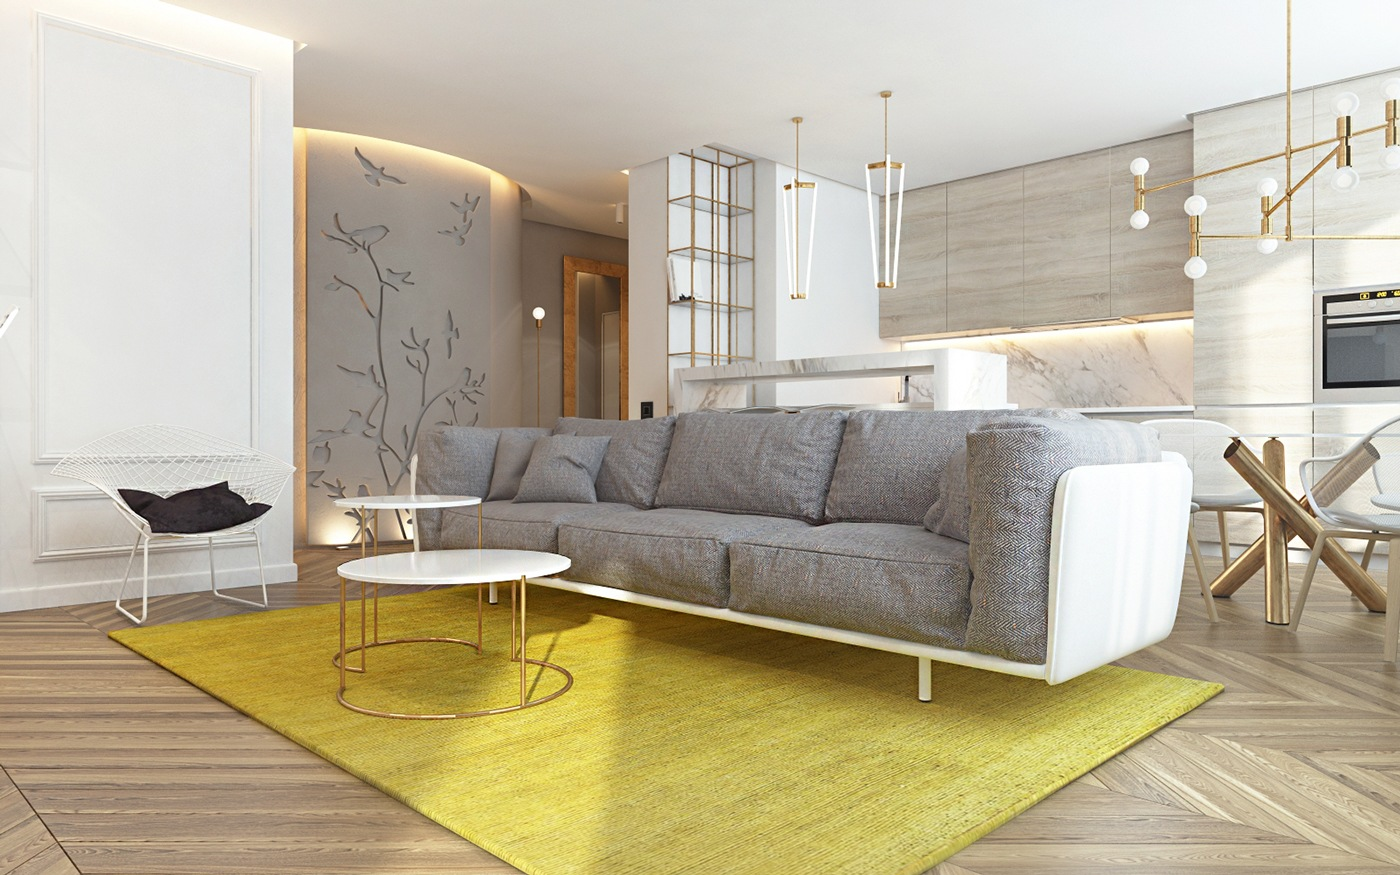 Gray And Yellow Interior